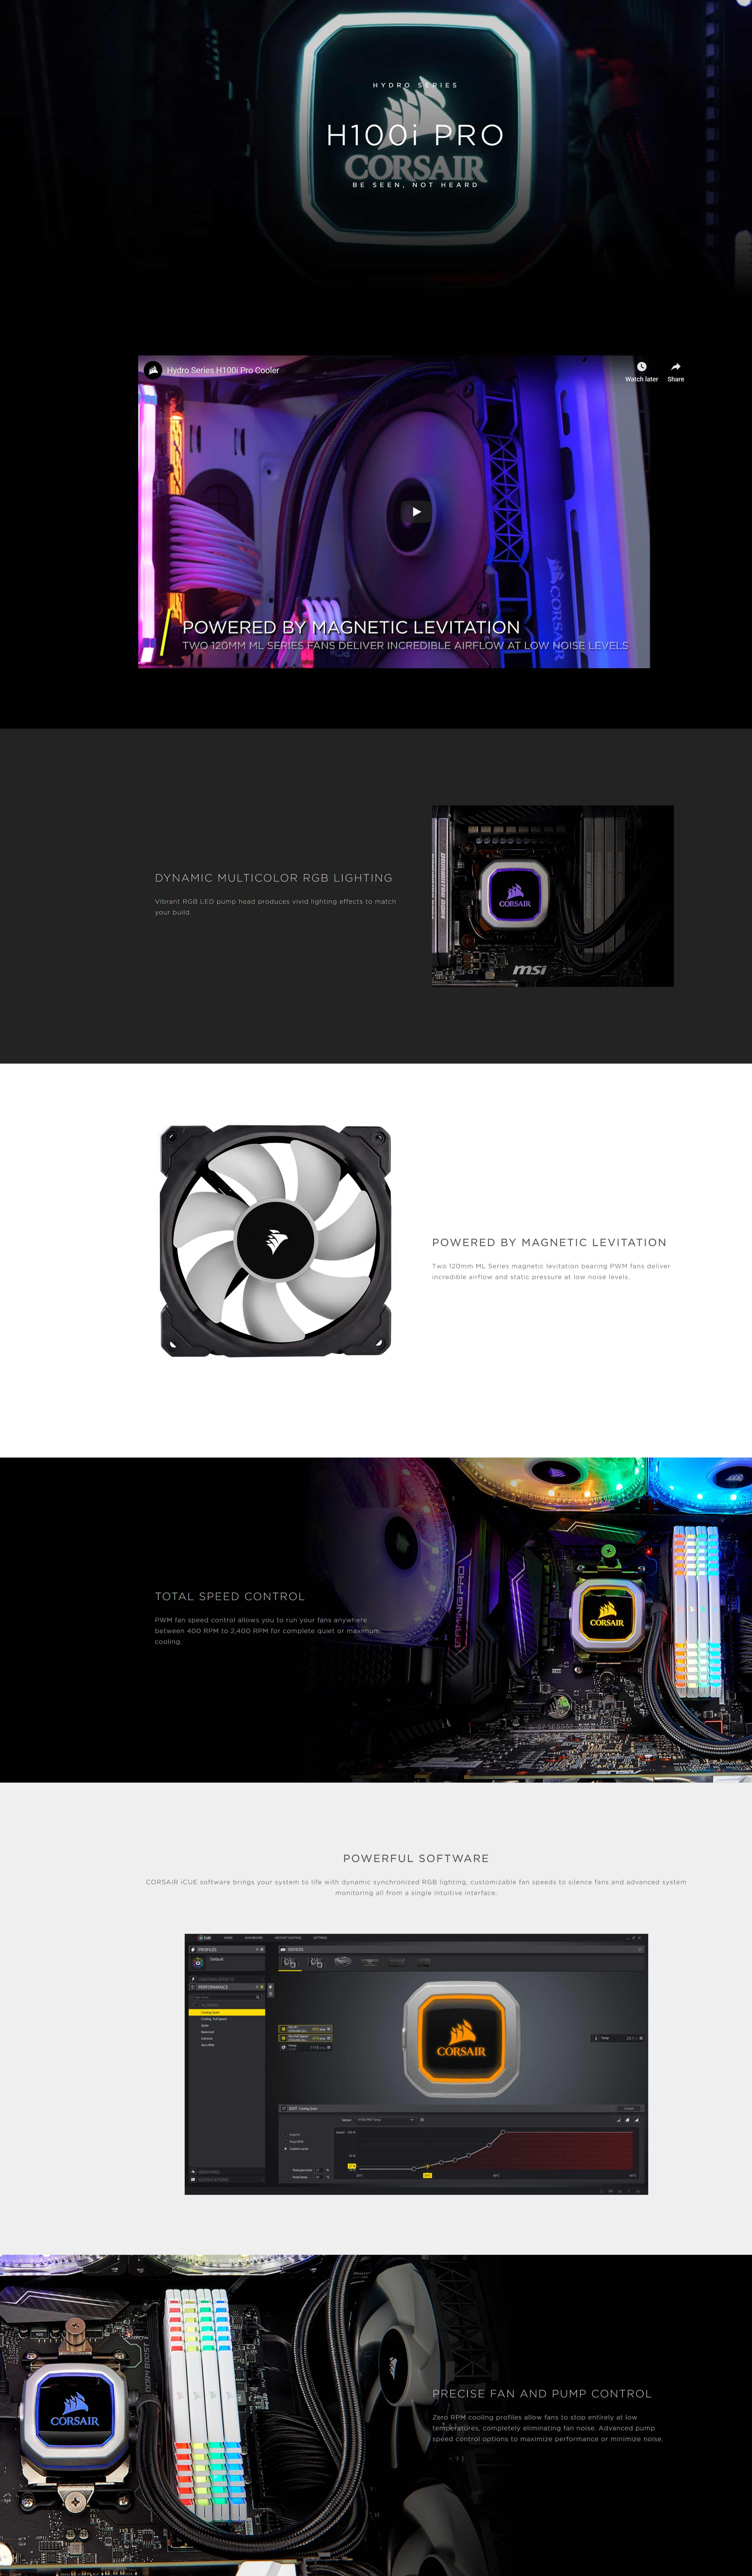 screencapture-corsair-us-en-Categories-Products-Liquid-Cooling-Digital-Control-and-Monitoring-Liquid-Coolers-Hydro-Series-H100i-PRO-RGB-Liquid-CPU-Cooler-p-CW-9060033-WW-2019-1.jpg